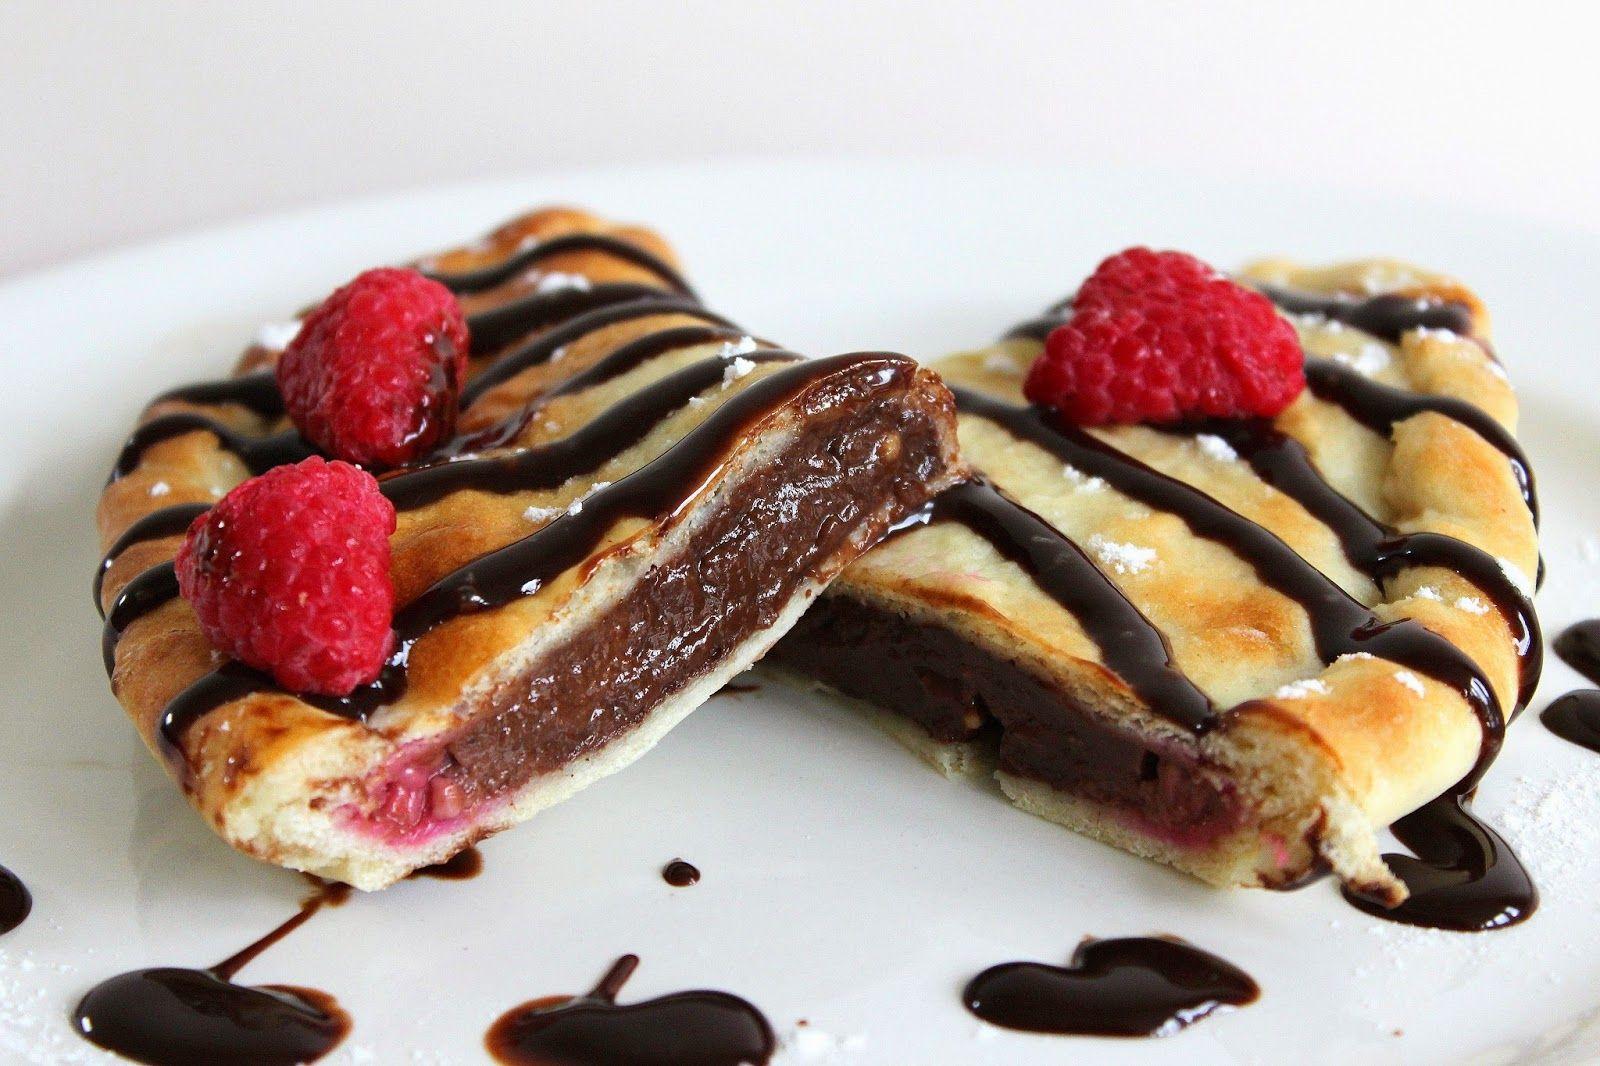 PicNic: Chocolate and Raspberry Calzones